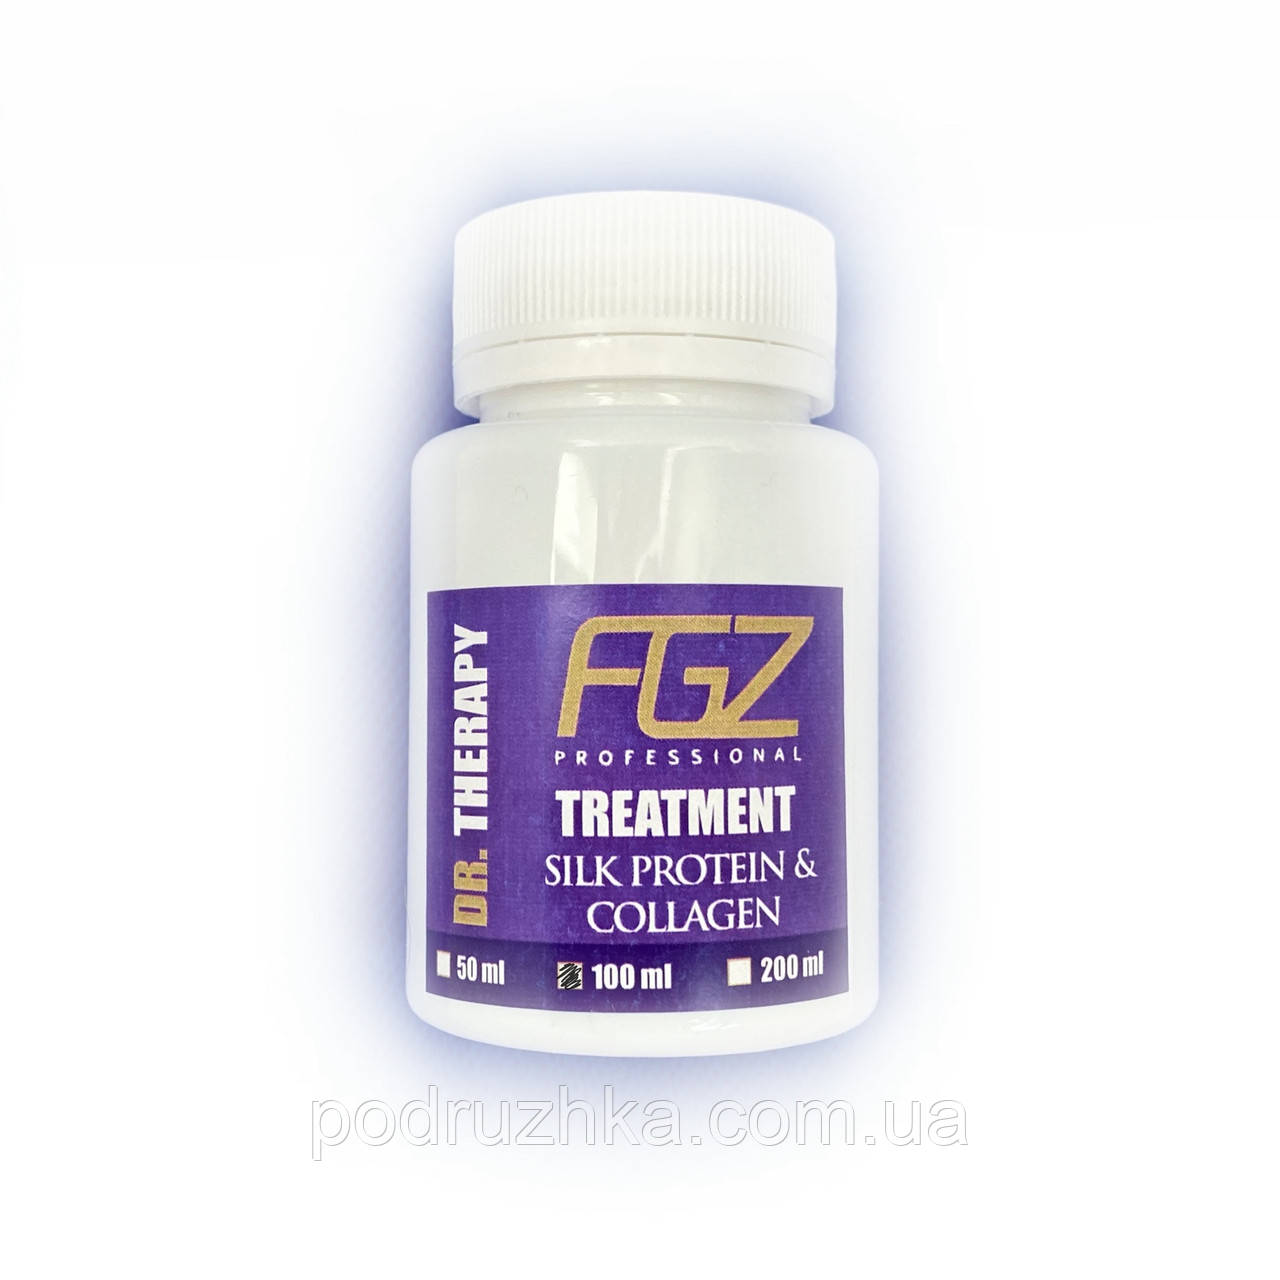 Кератин-энзим (нанопластика) Dr.Therapy, 100 мл